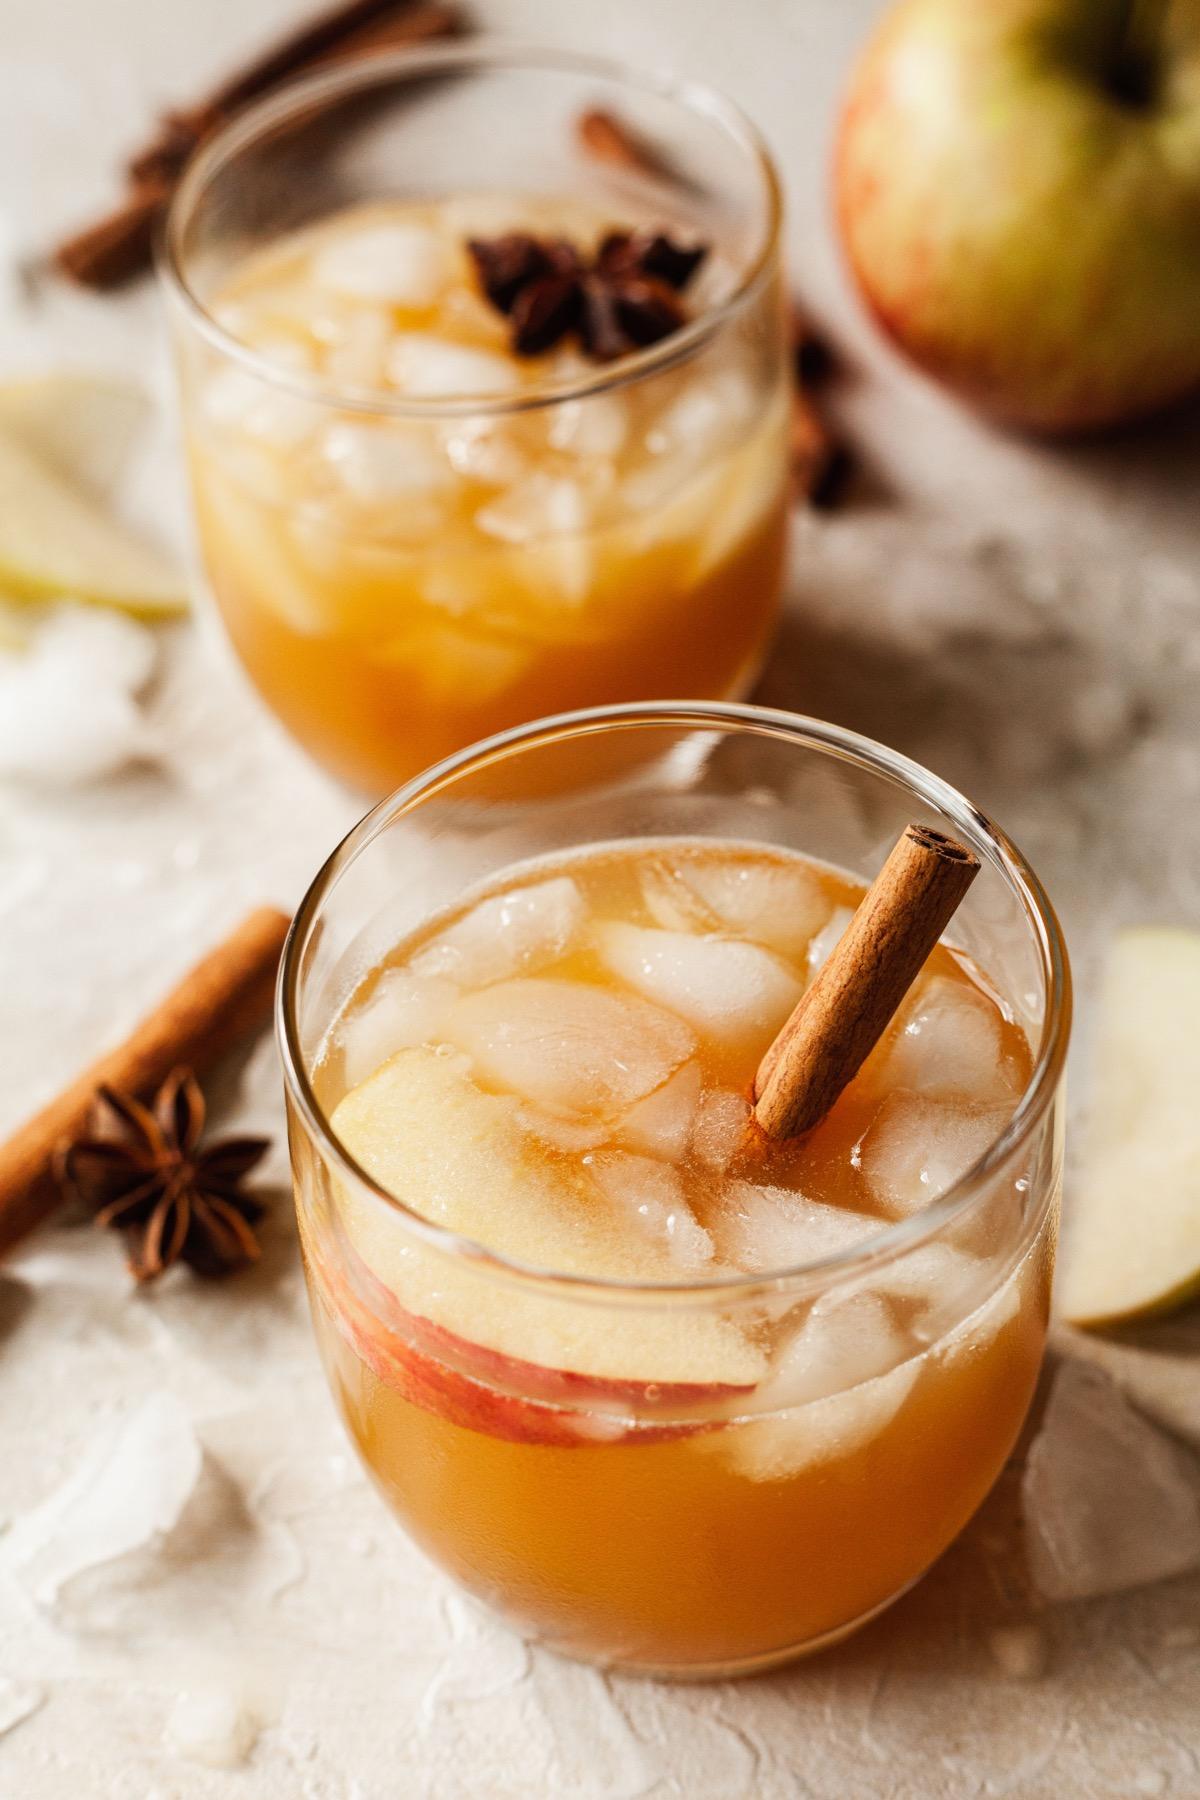 two apple cider bourbon cocktails with cinnamon sticks